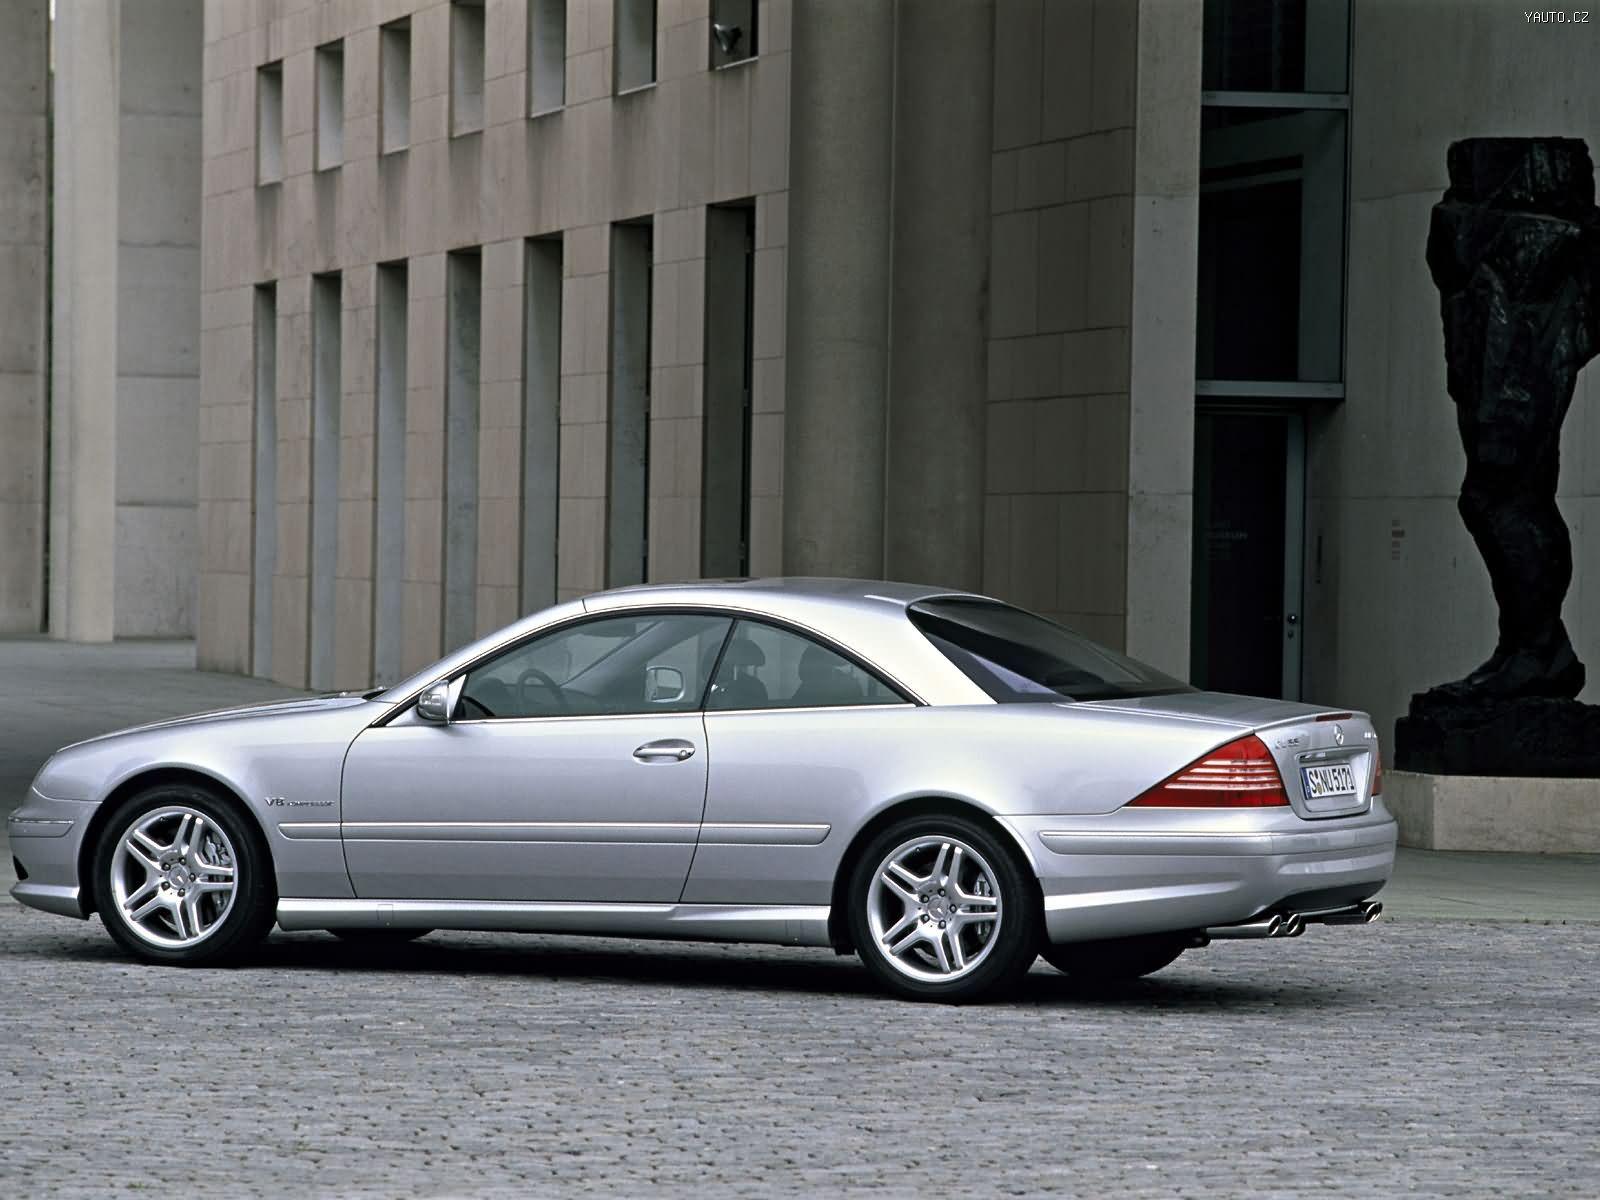 Mercedes benz cl55 amg 2000 auta na plochu tapety na for Mercedes benz amg 55